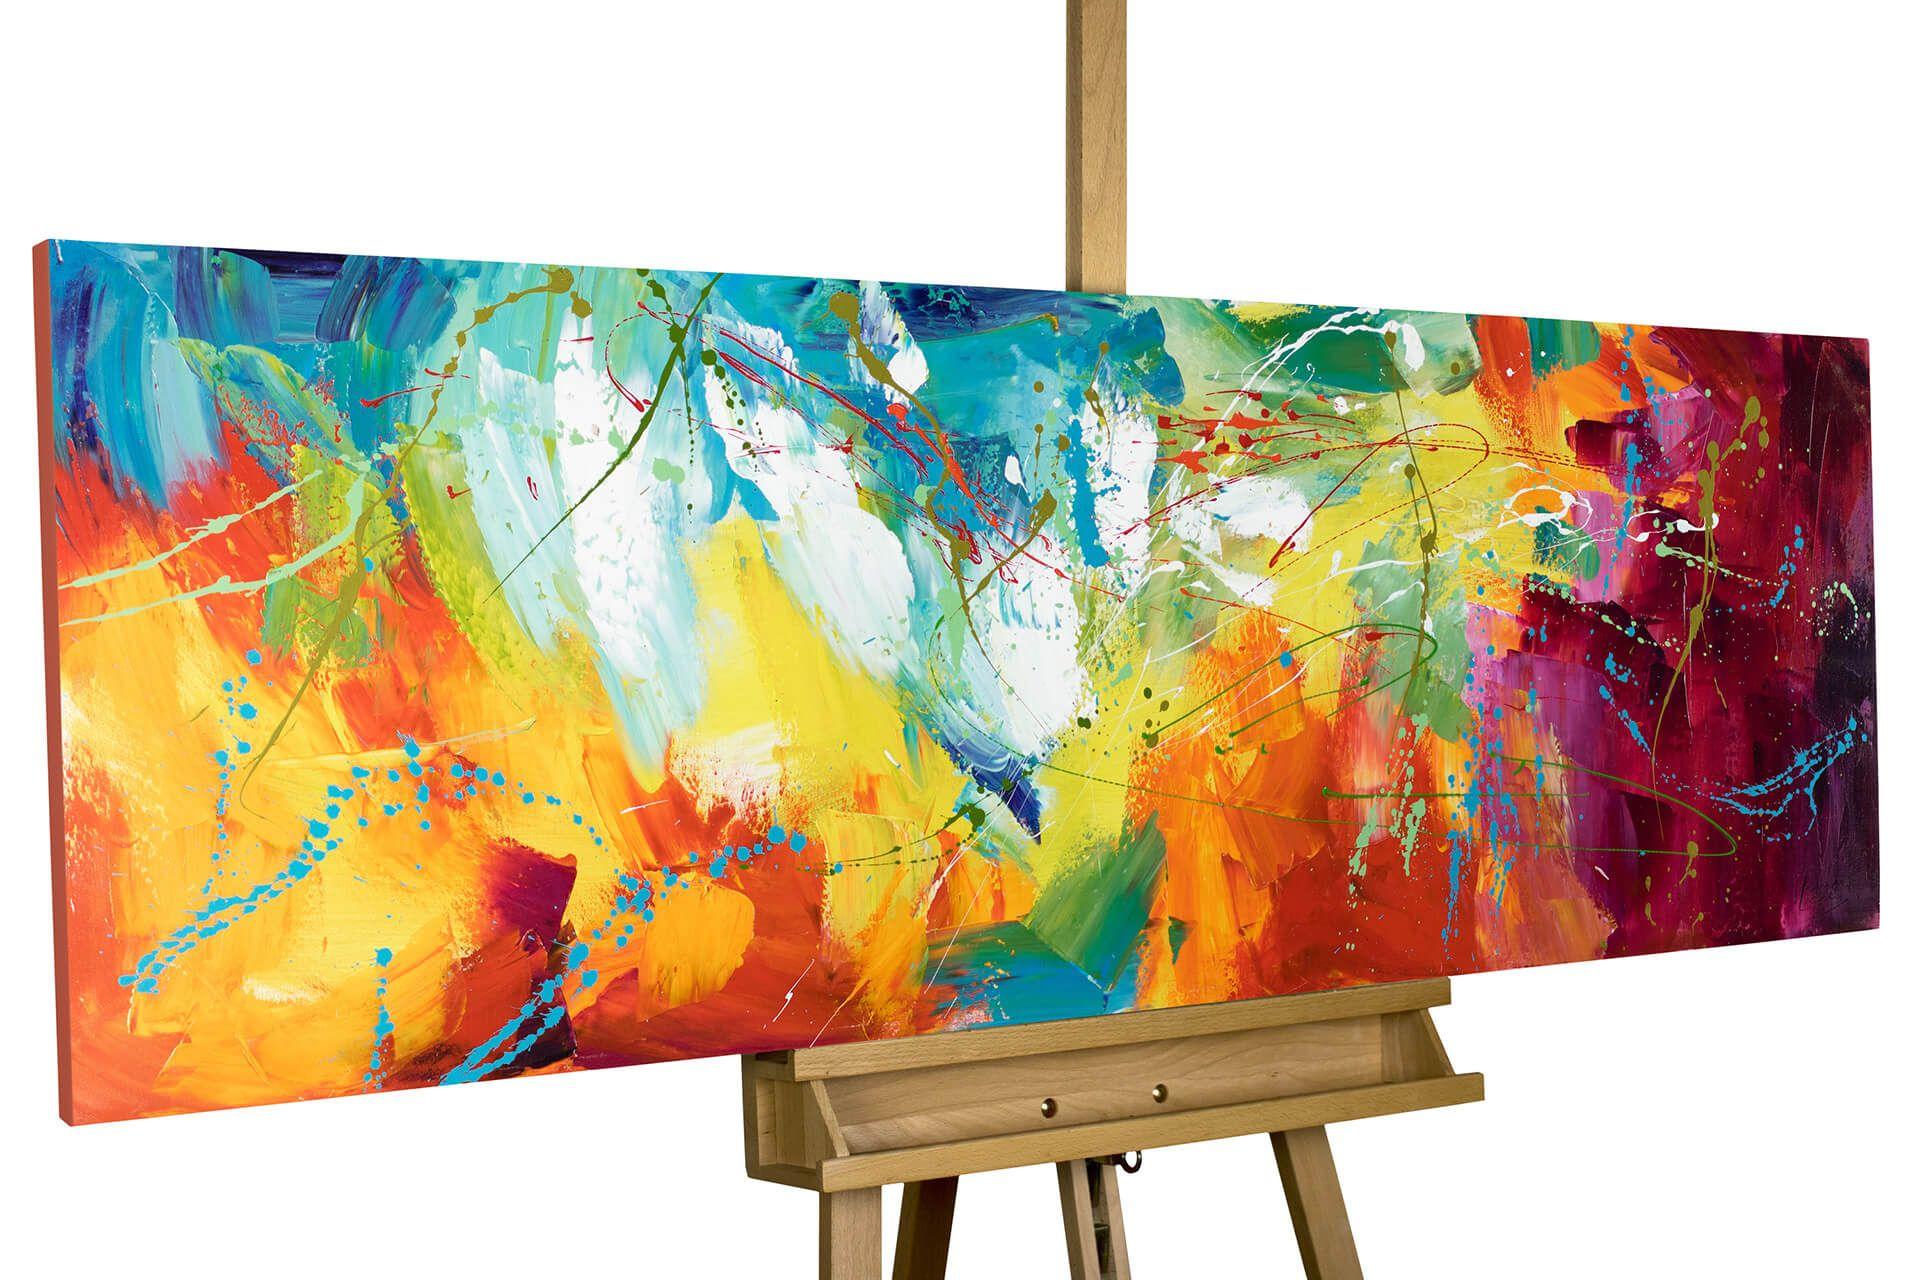 Acryl Gemälde Bright Future 150x50cm Acrylmalerei Abstrakt Abstrakt Gemälde